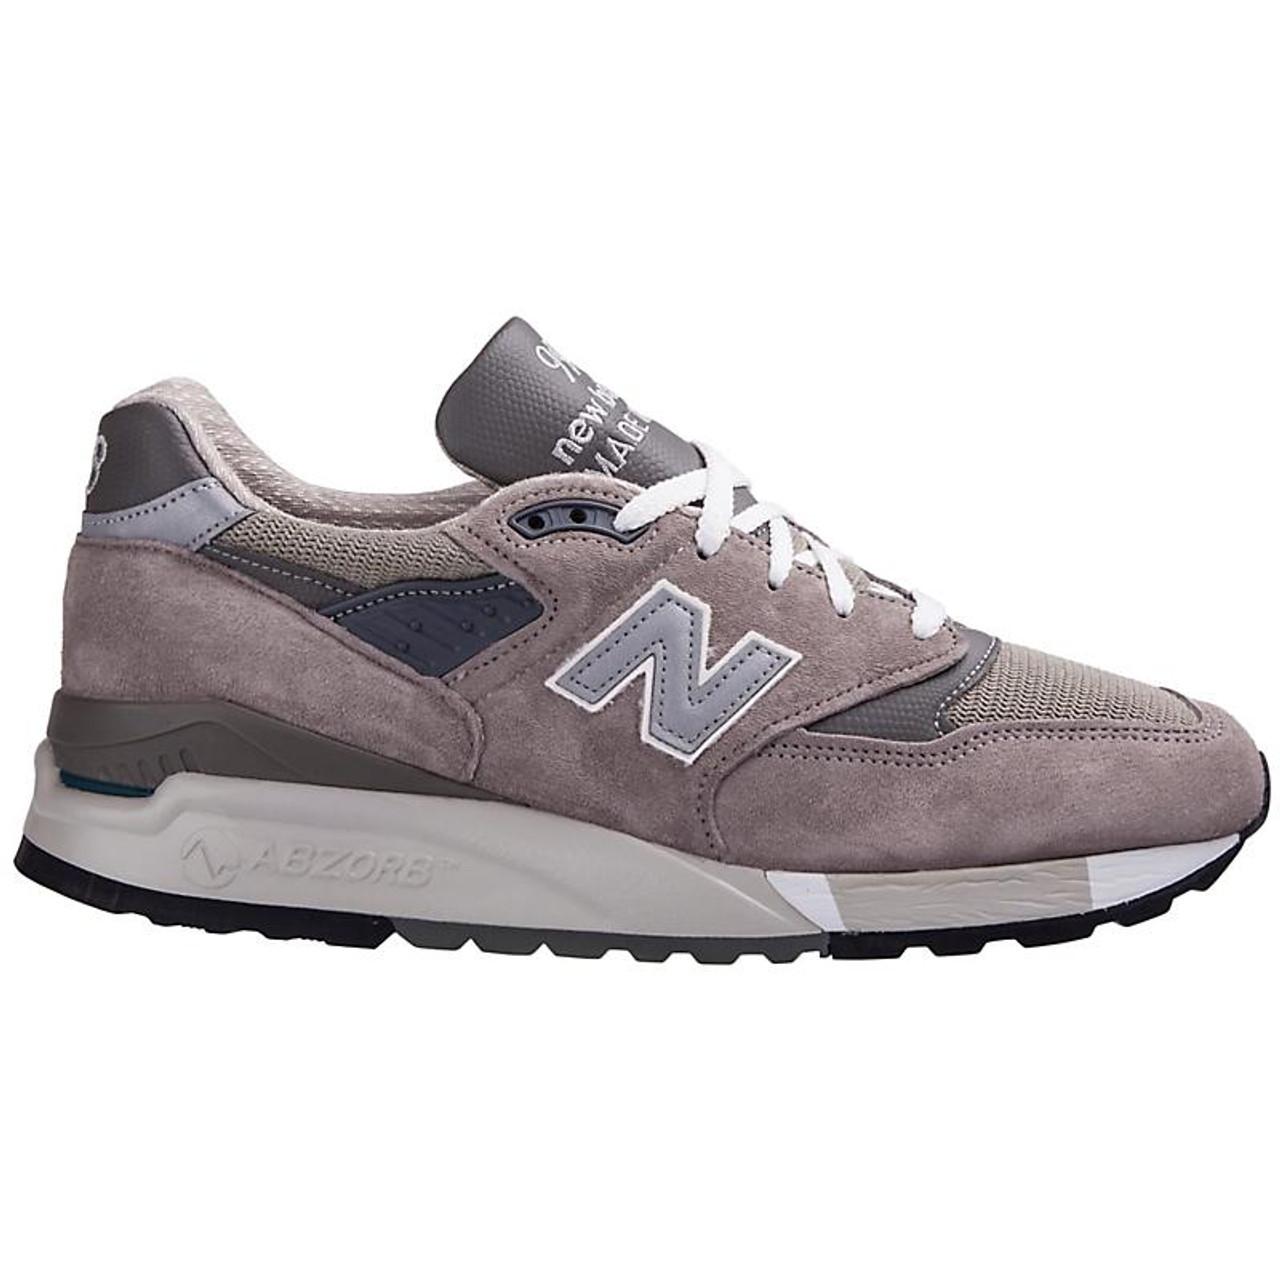 998 GR Classic Running Shoe